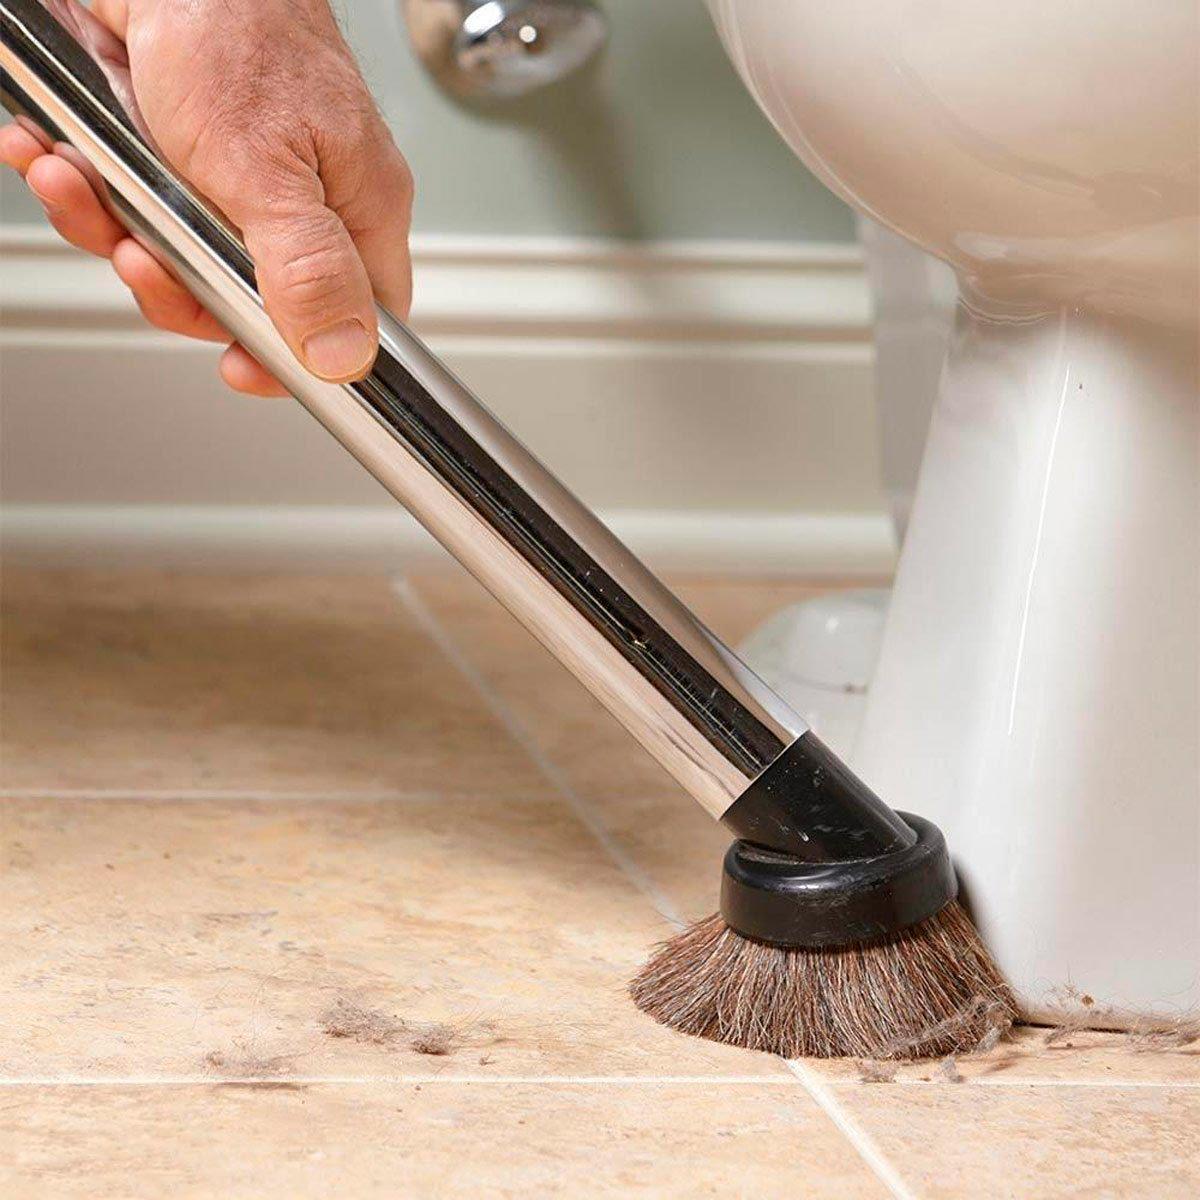 Vacuum first, then scrub